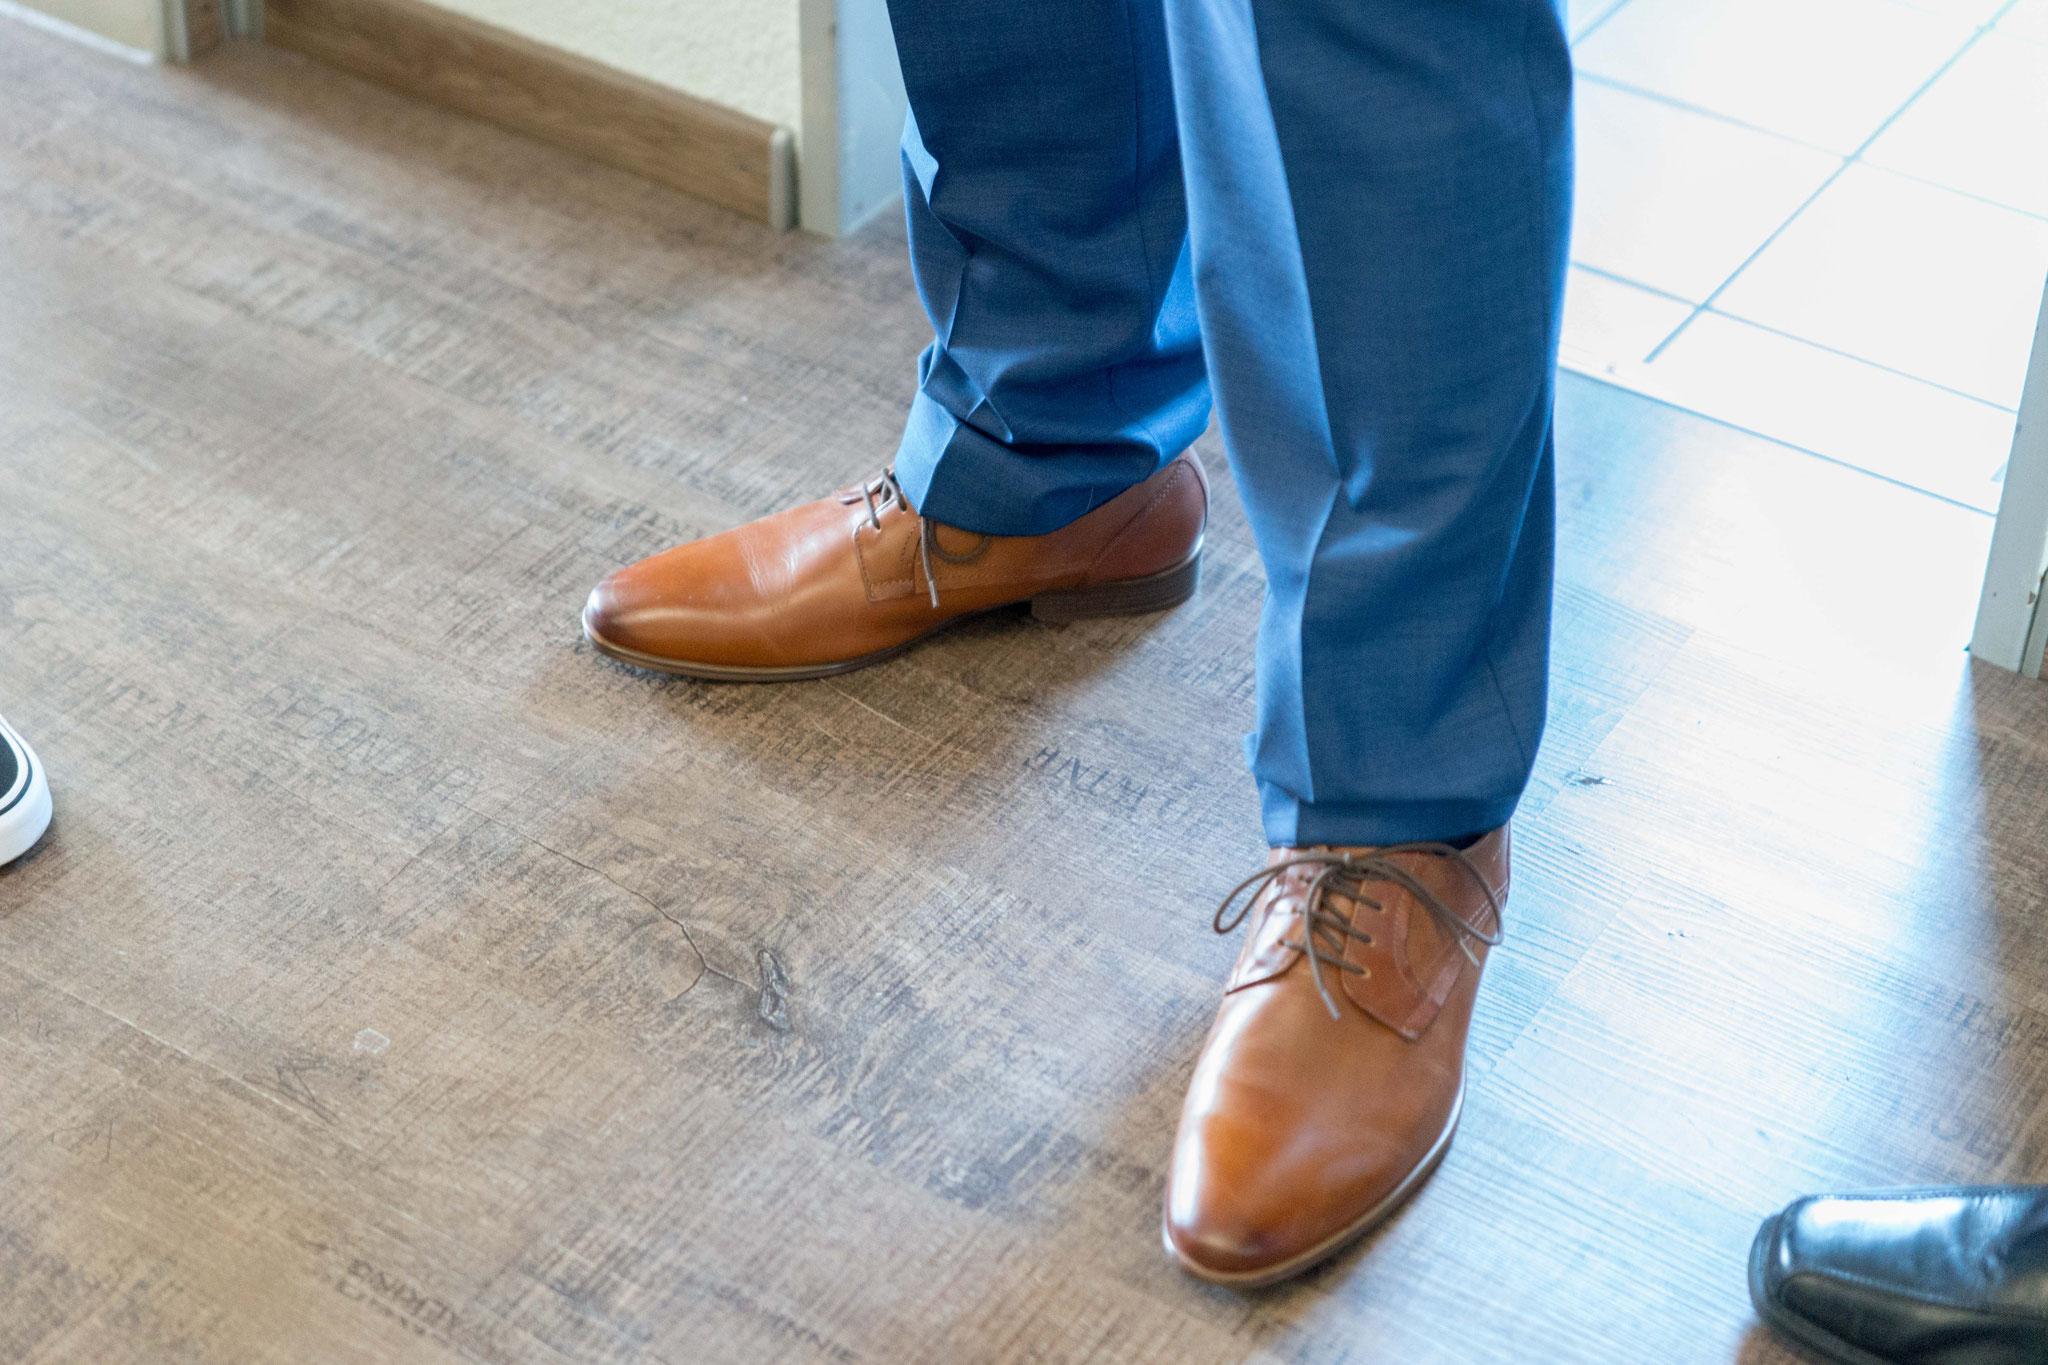 den Schuhen.